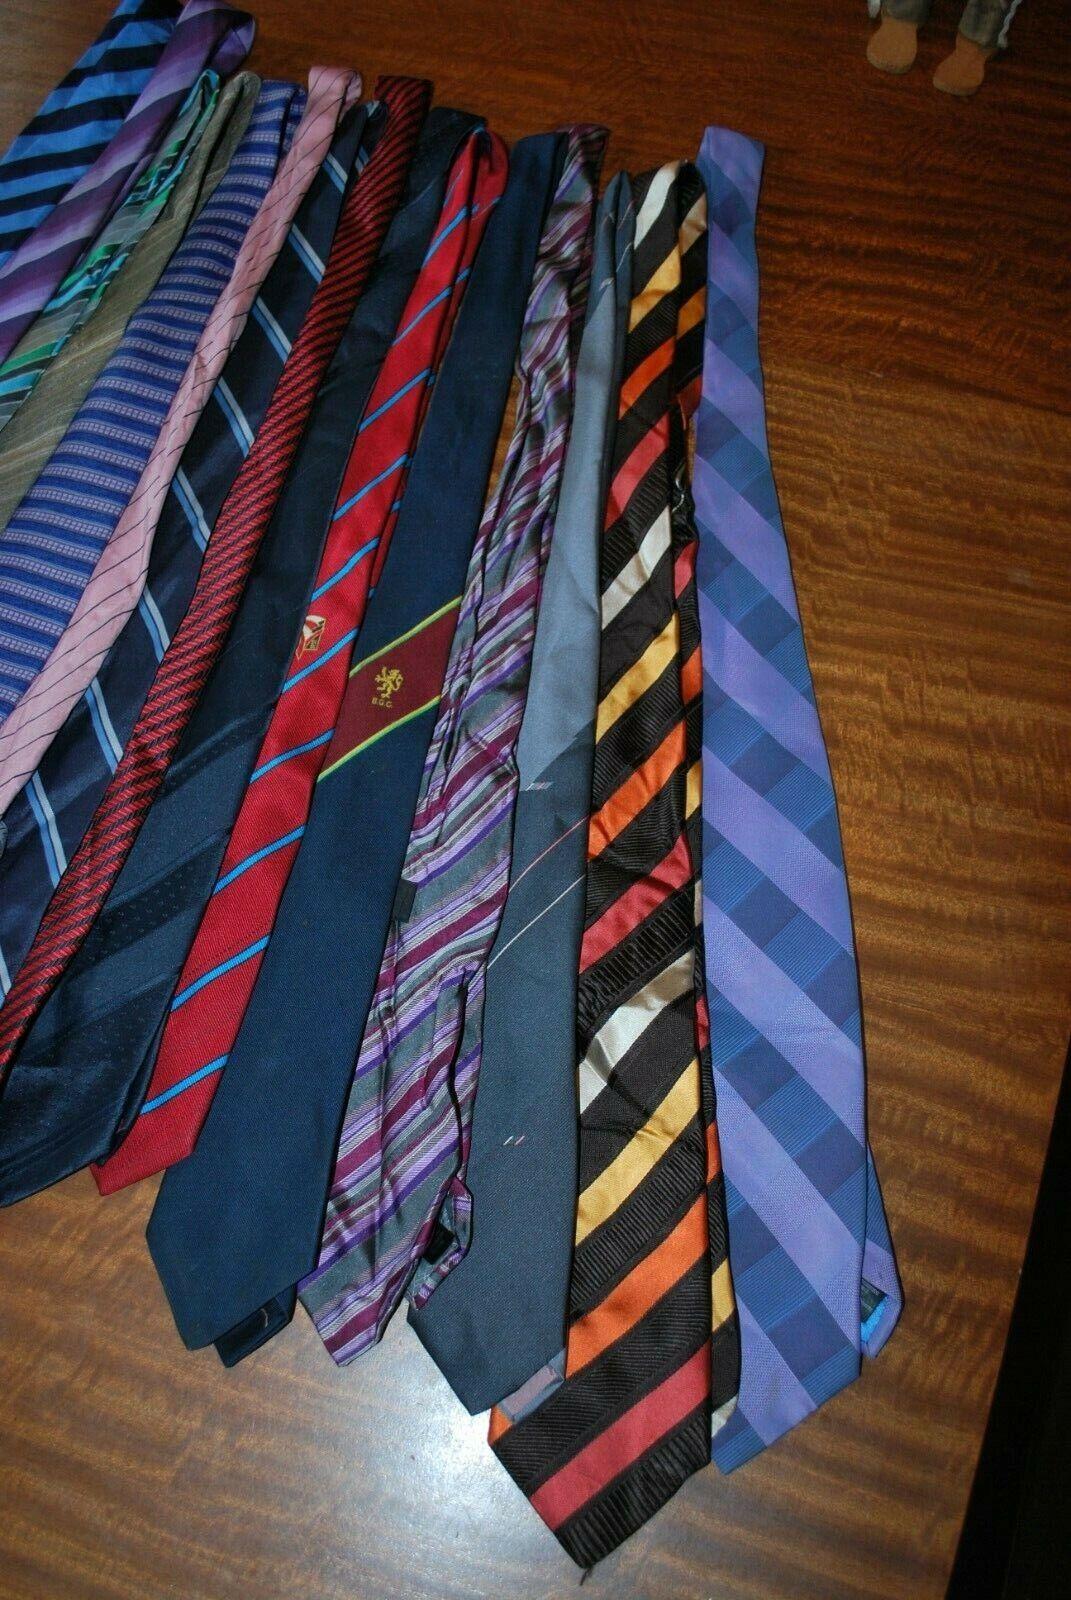 15 x various coloured striped Tie's job lot bulk buy 8